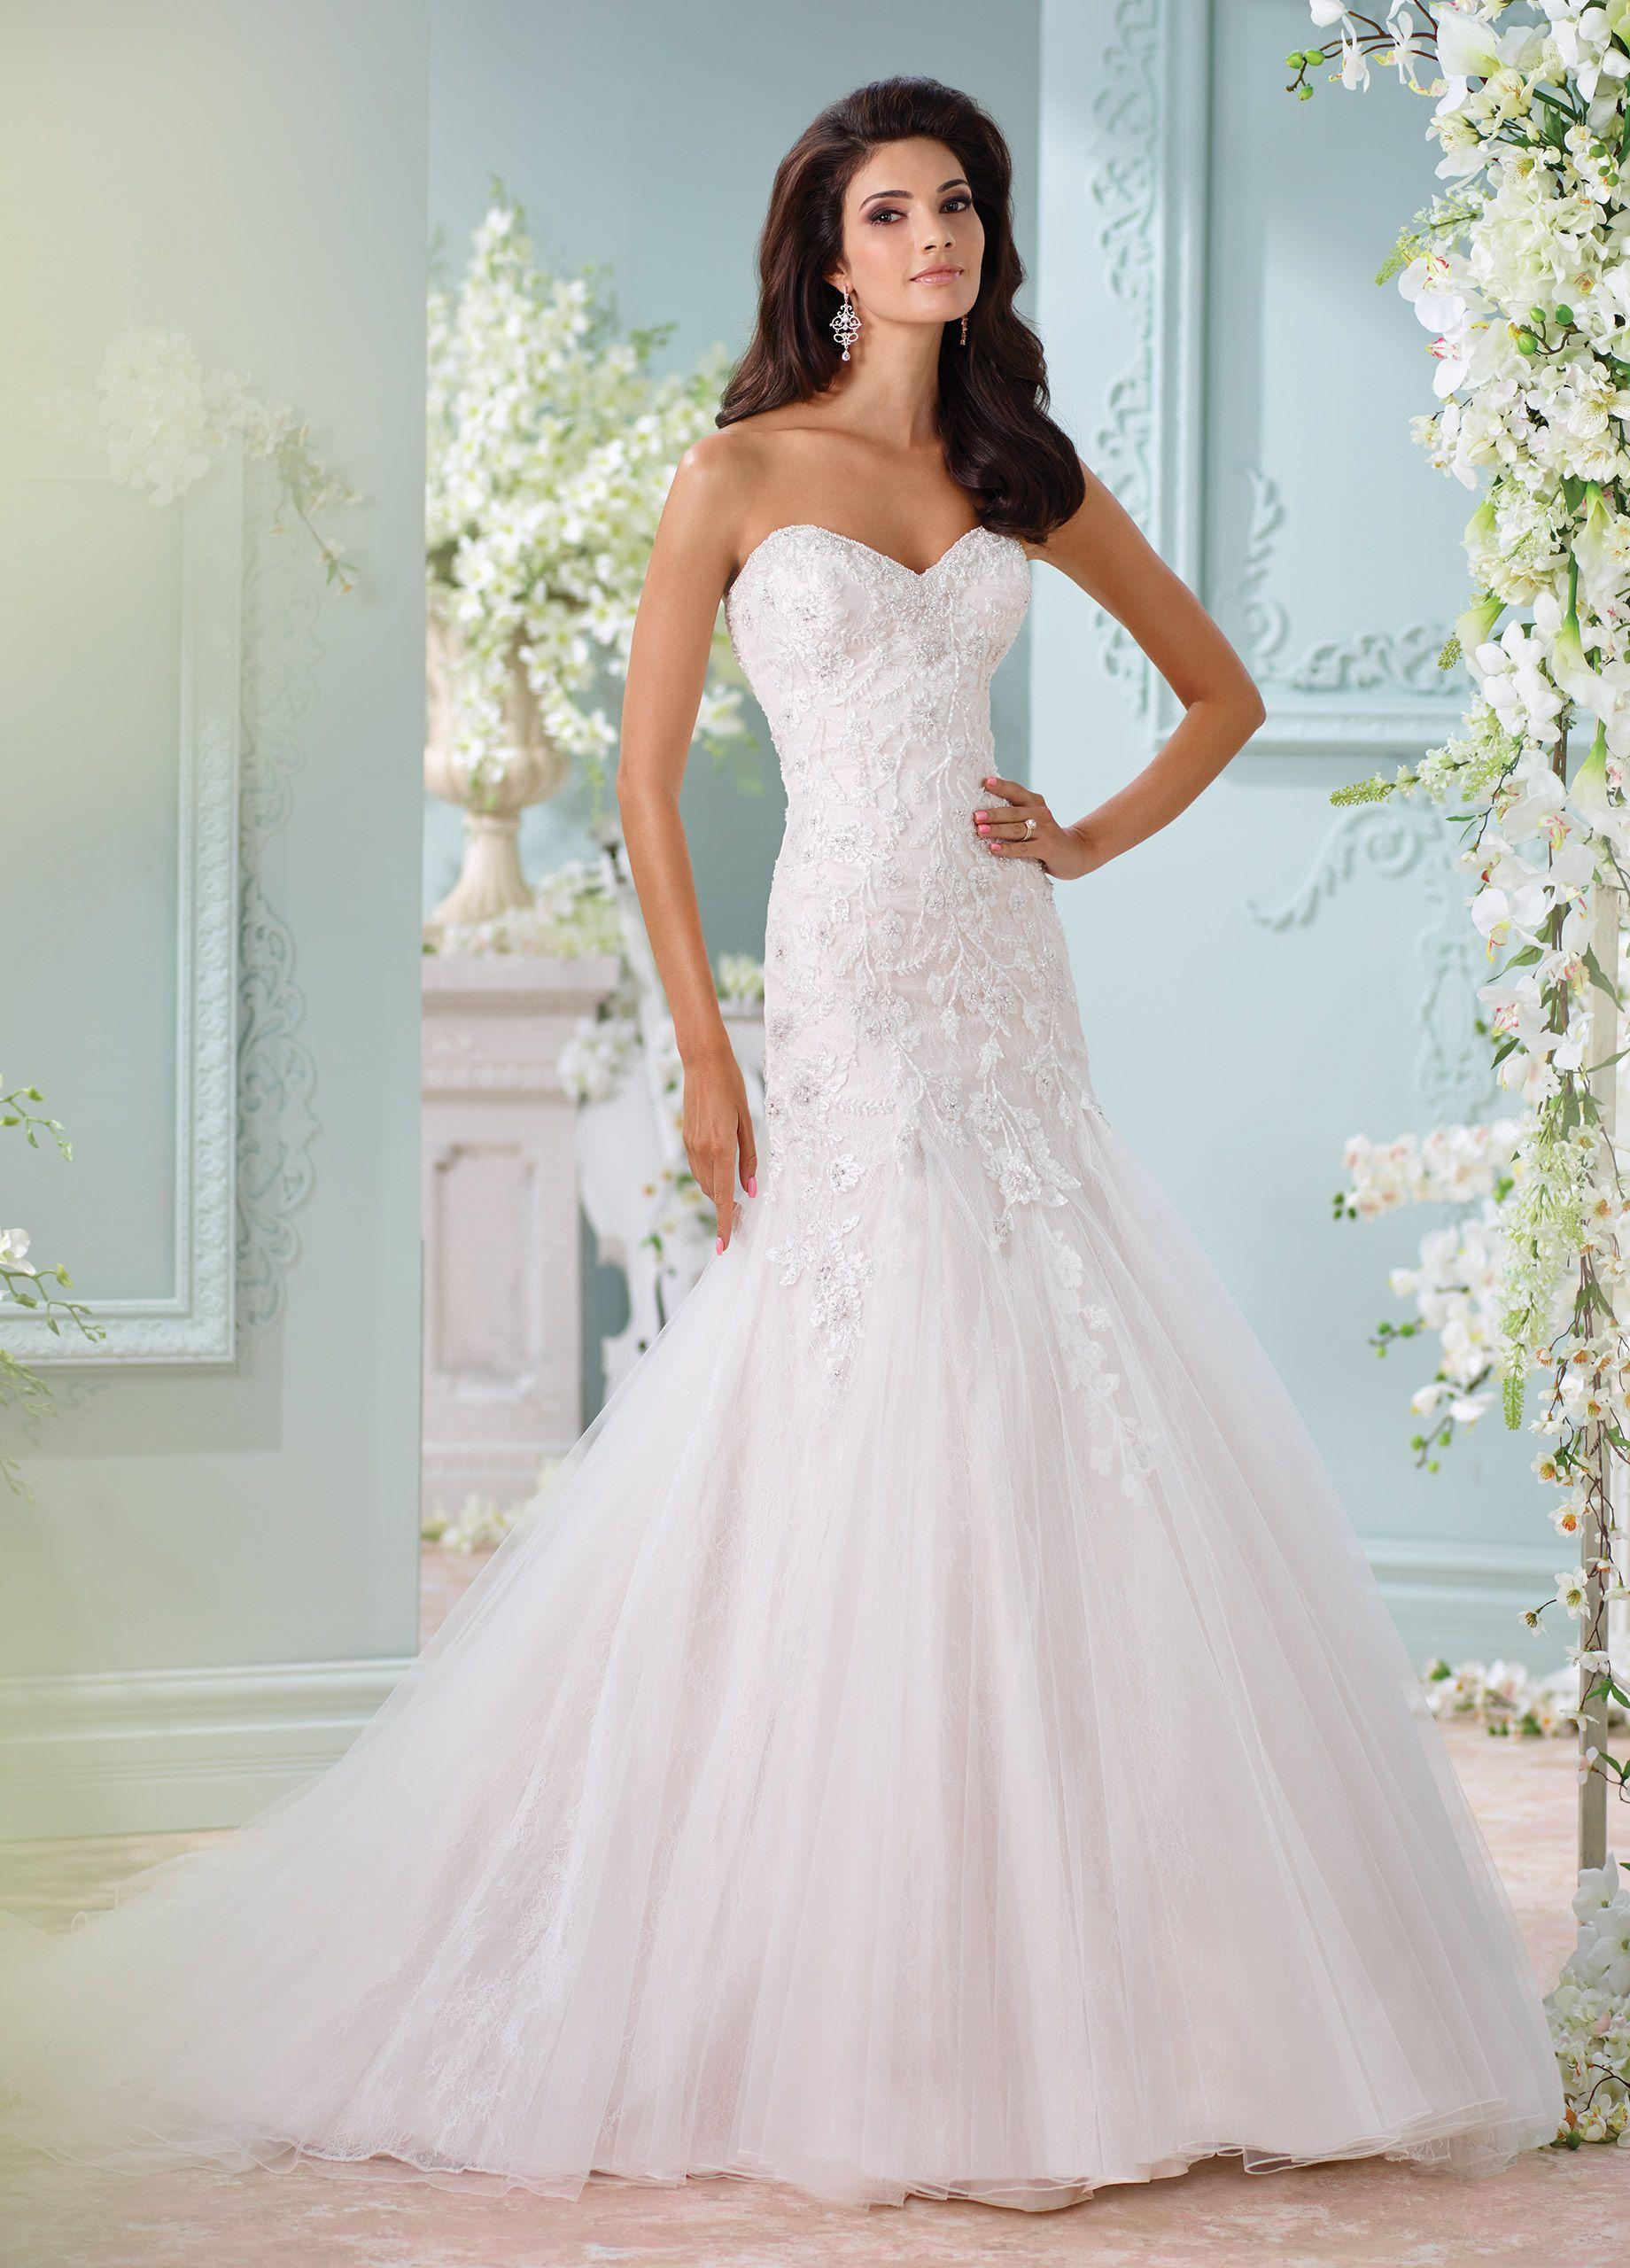 Dropped waist wedding dress  Chantilly Lace Embroidered Trumpet Wedding Dress  Lita